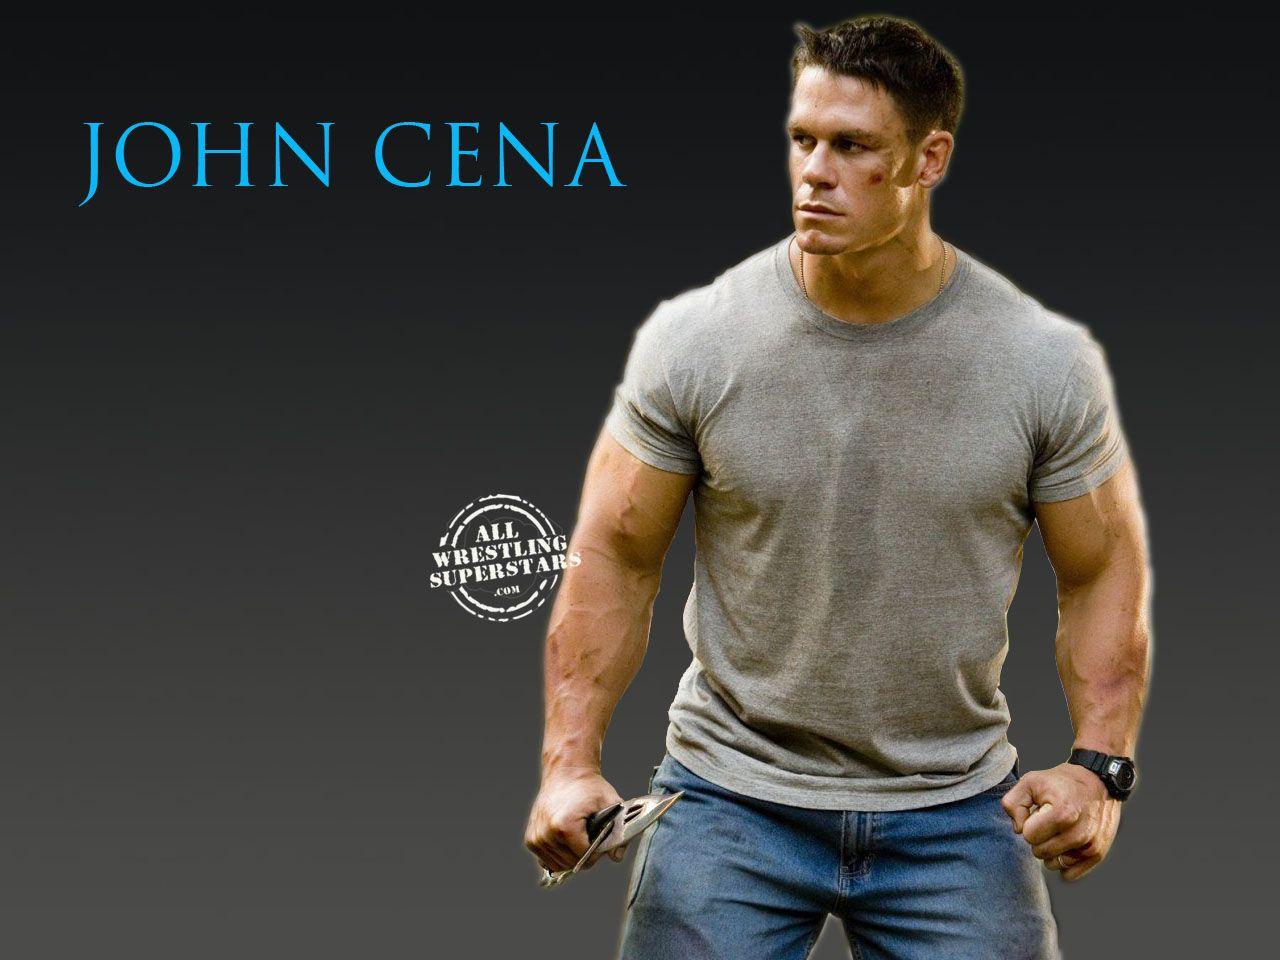 John cena - 25 Best Ideas About Photos Of John Cena On Pinterest John Cena Wrestling John Cena And Daniel Bryan